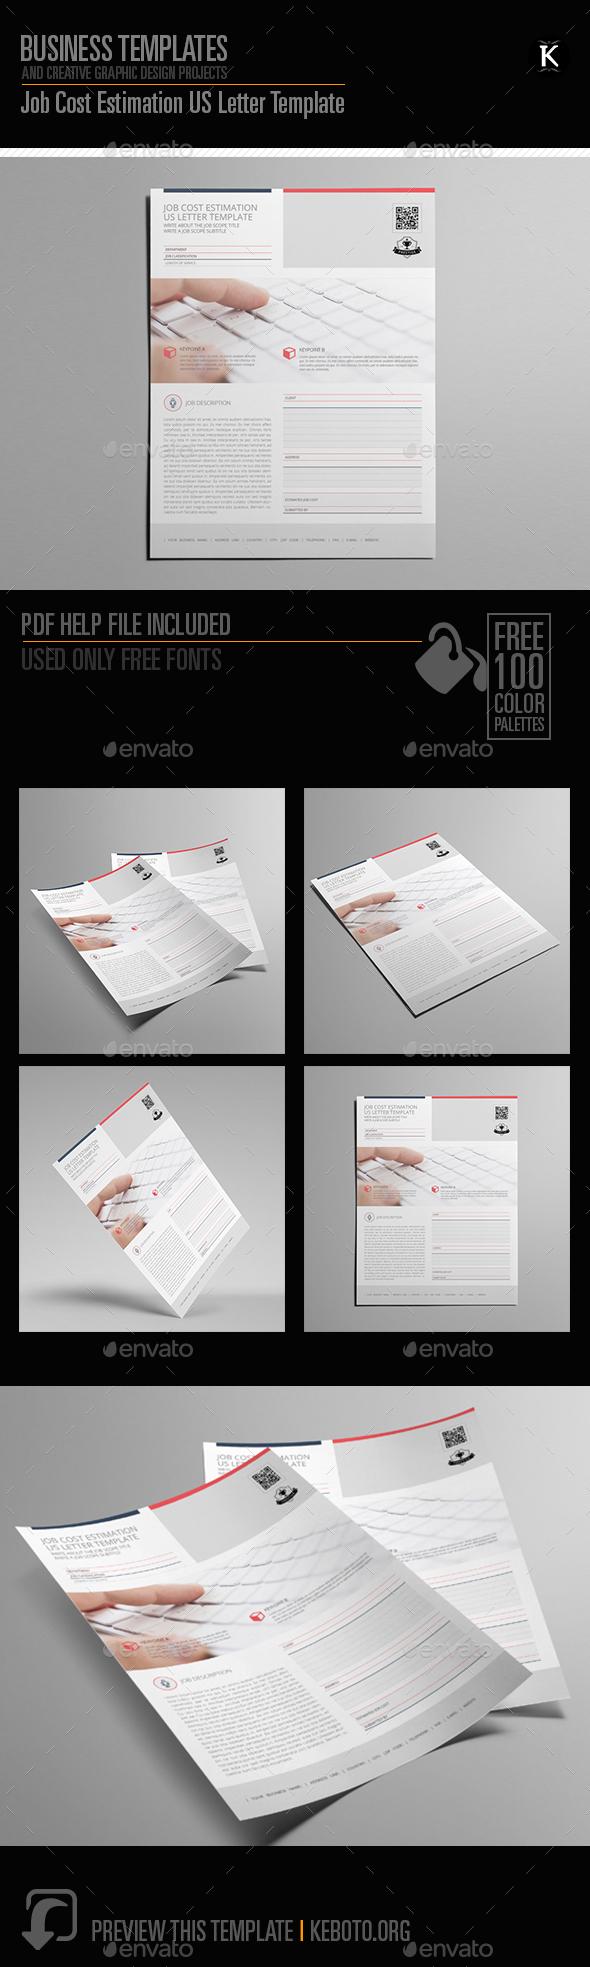 GraphicRiver Job Cost Estimation US Letter Template 20580791